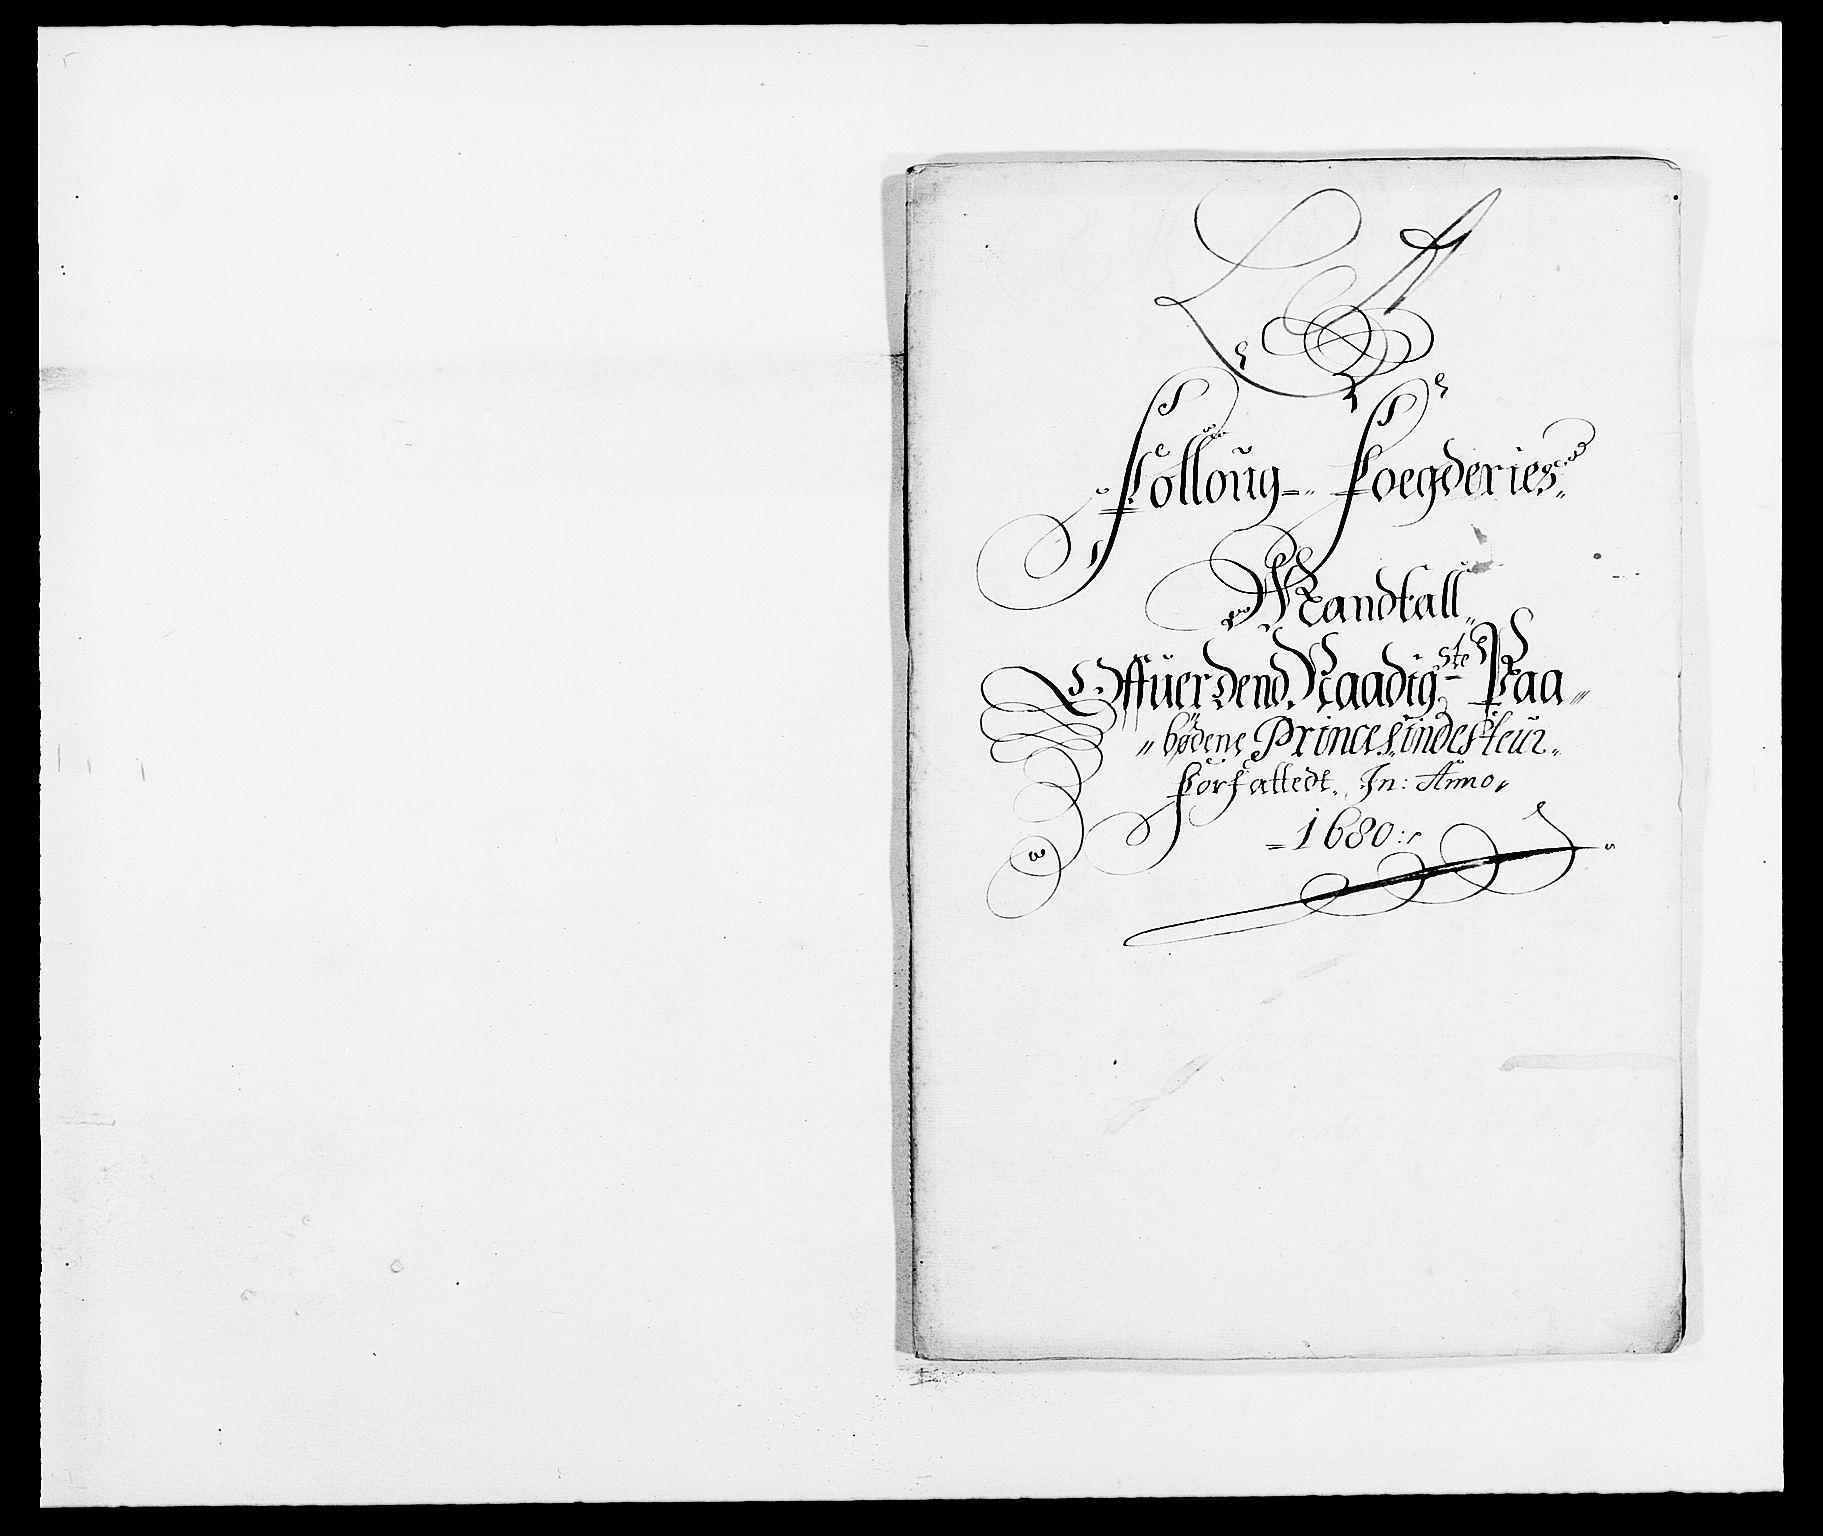 RA, Rentekammeret inntil 1814, Reviderte regnskaper, Fogderegnskap, R09/L0429: Fogderegnskap Follo, 1680-1681, s. 171